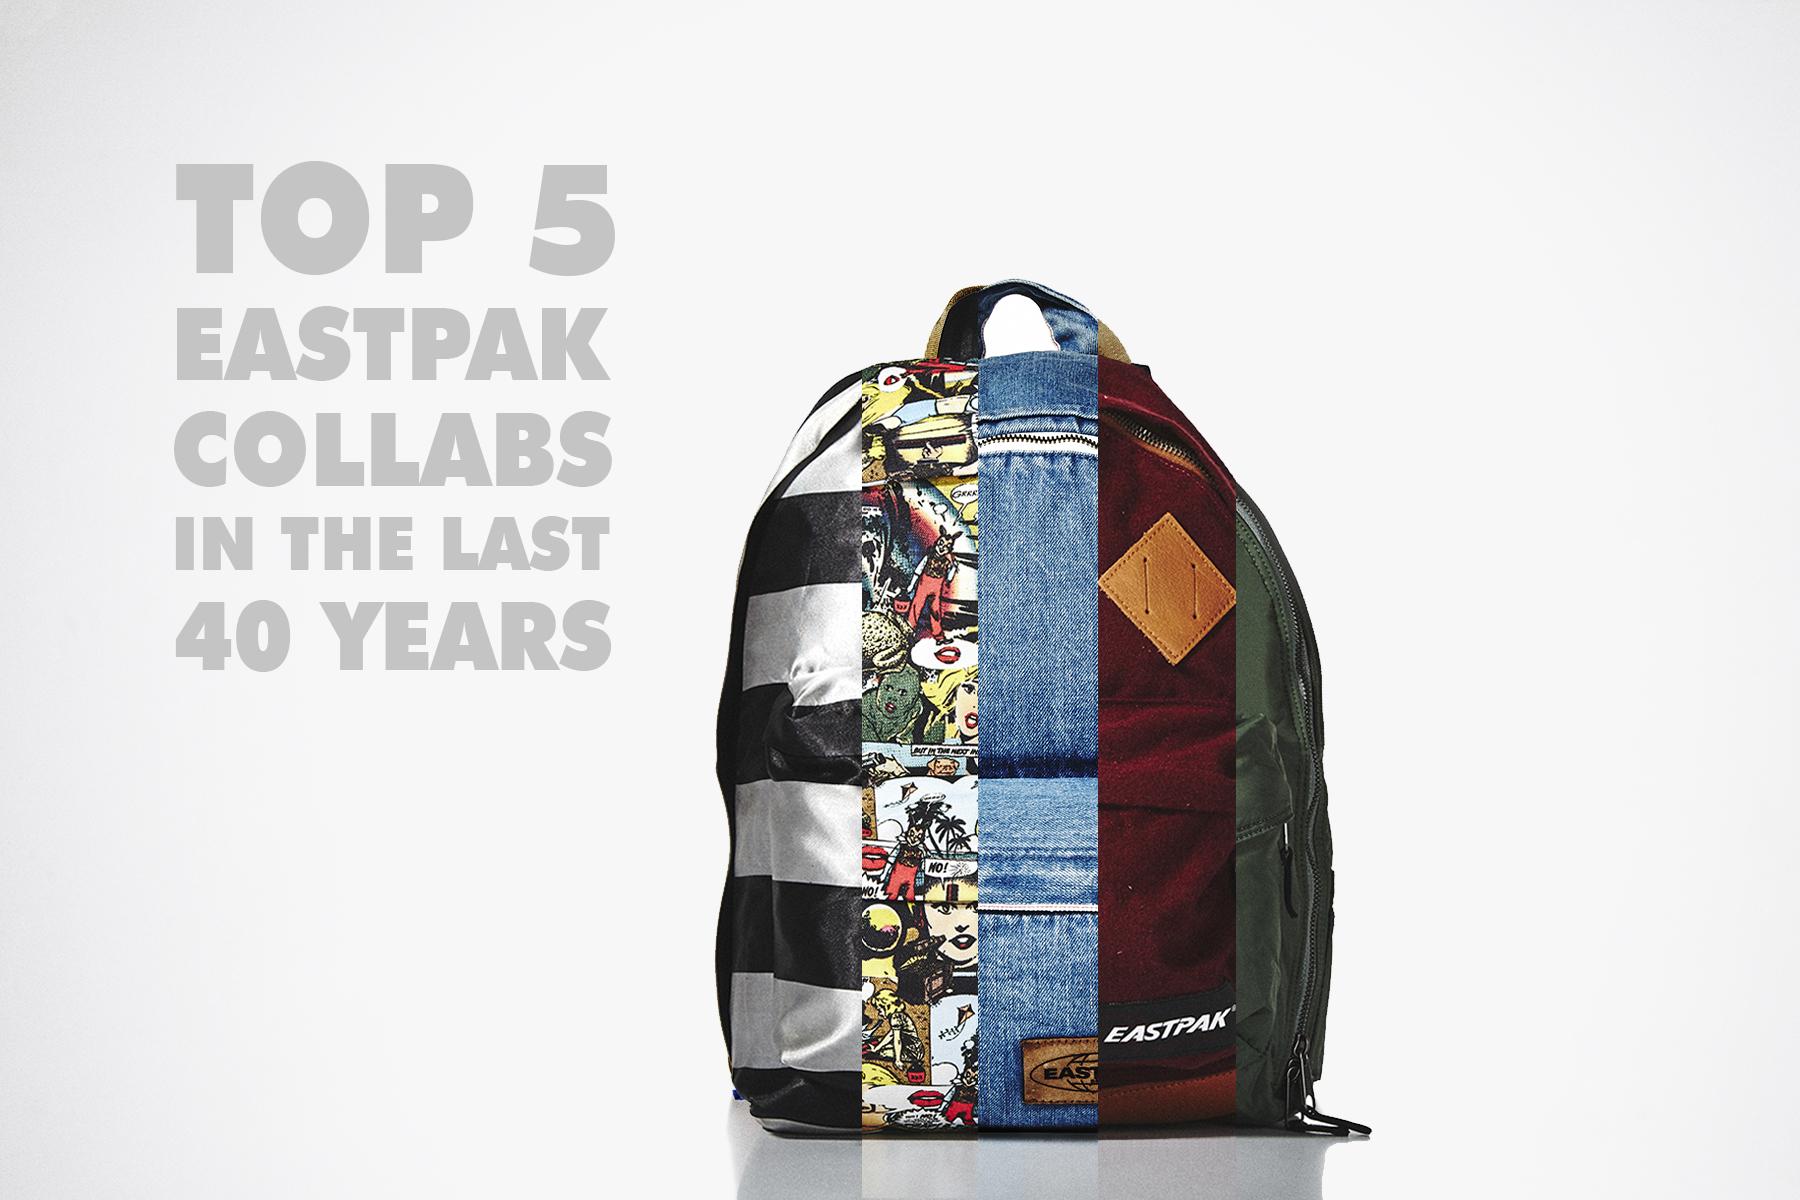 The OG Eastpak Backpack Turns 40 This Year